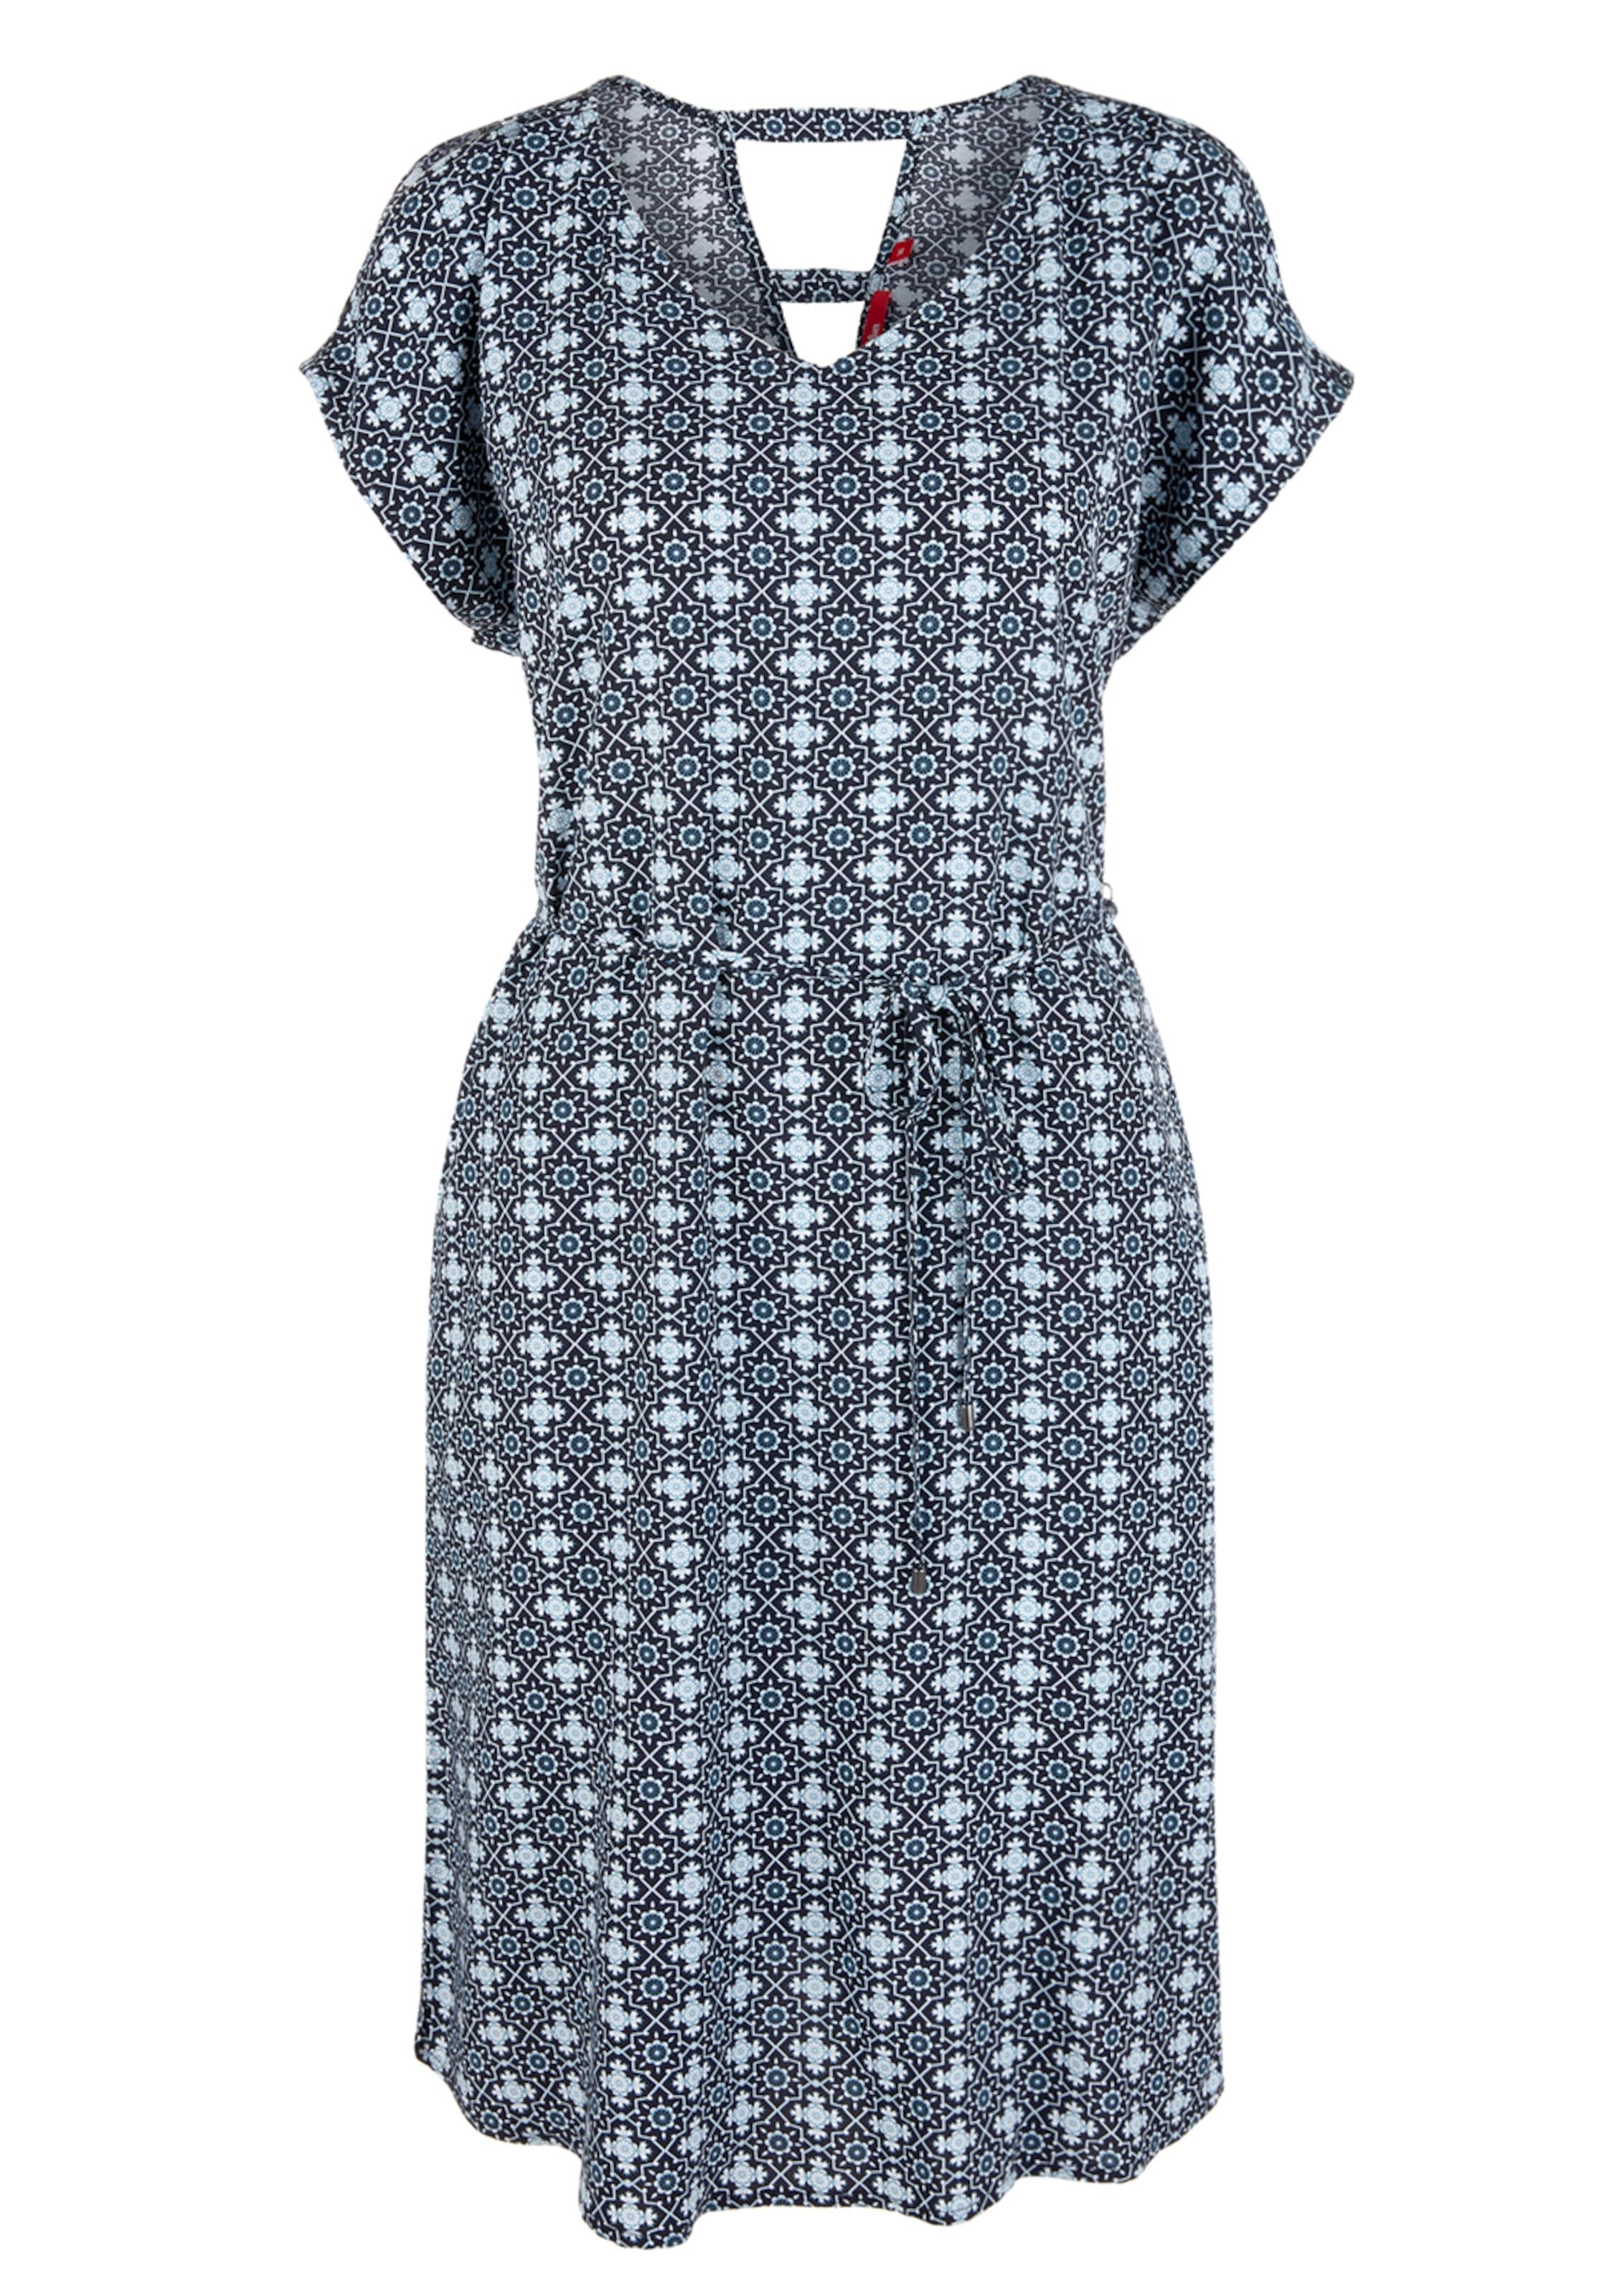 In oliver oliver Kleid Kleid S S NachtblauHellblau 0O8nwPXk